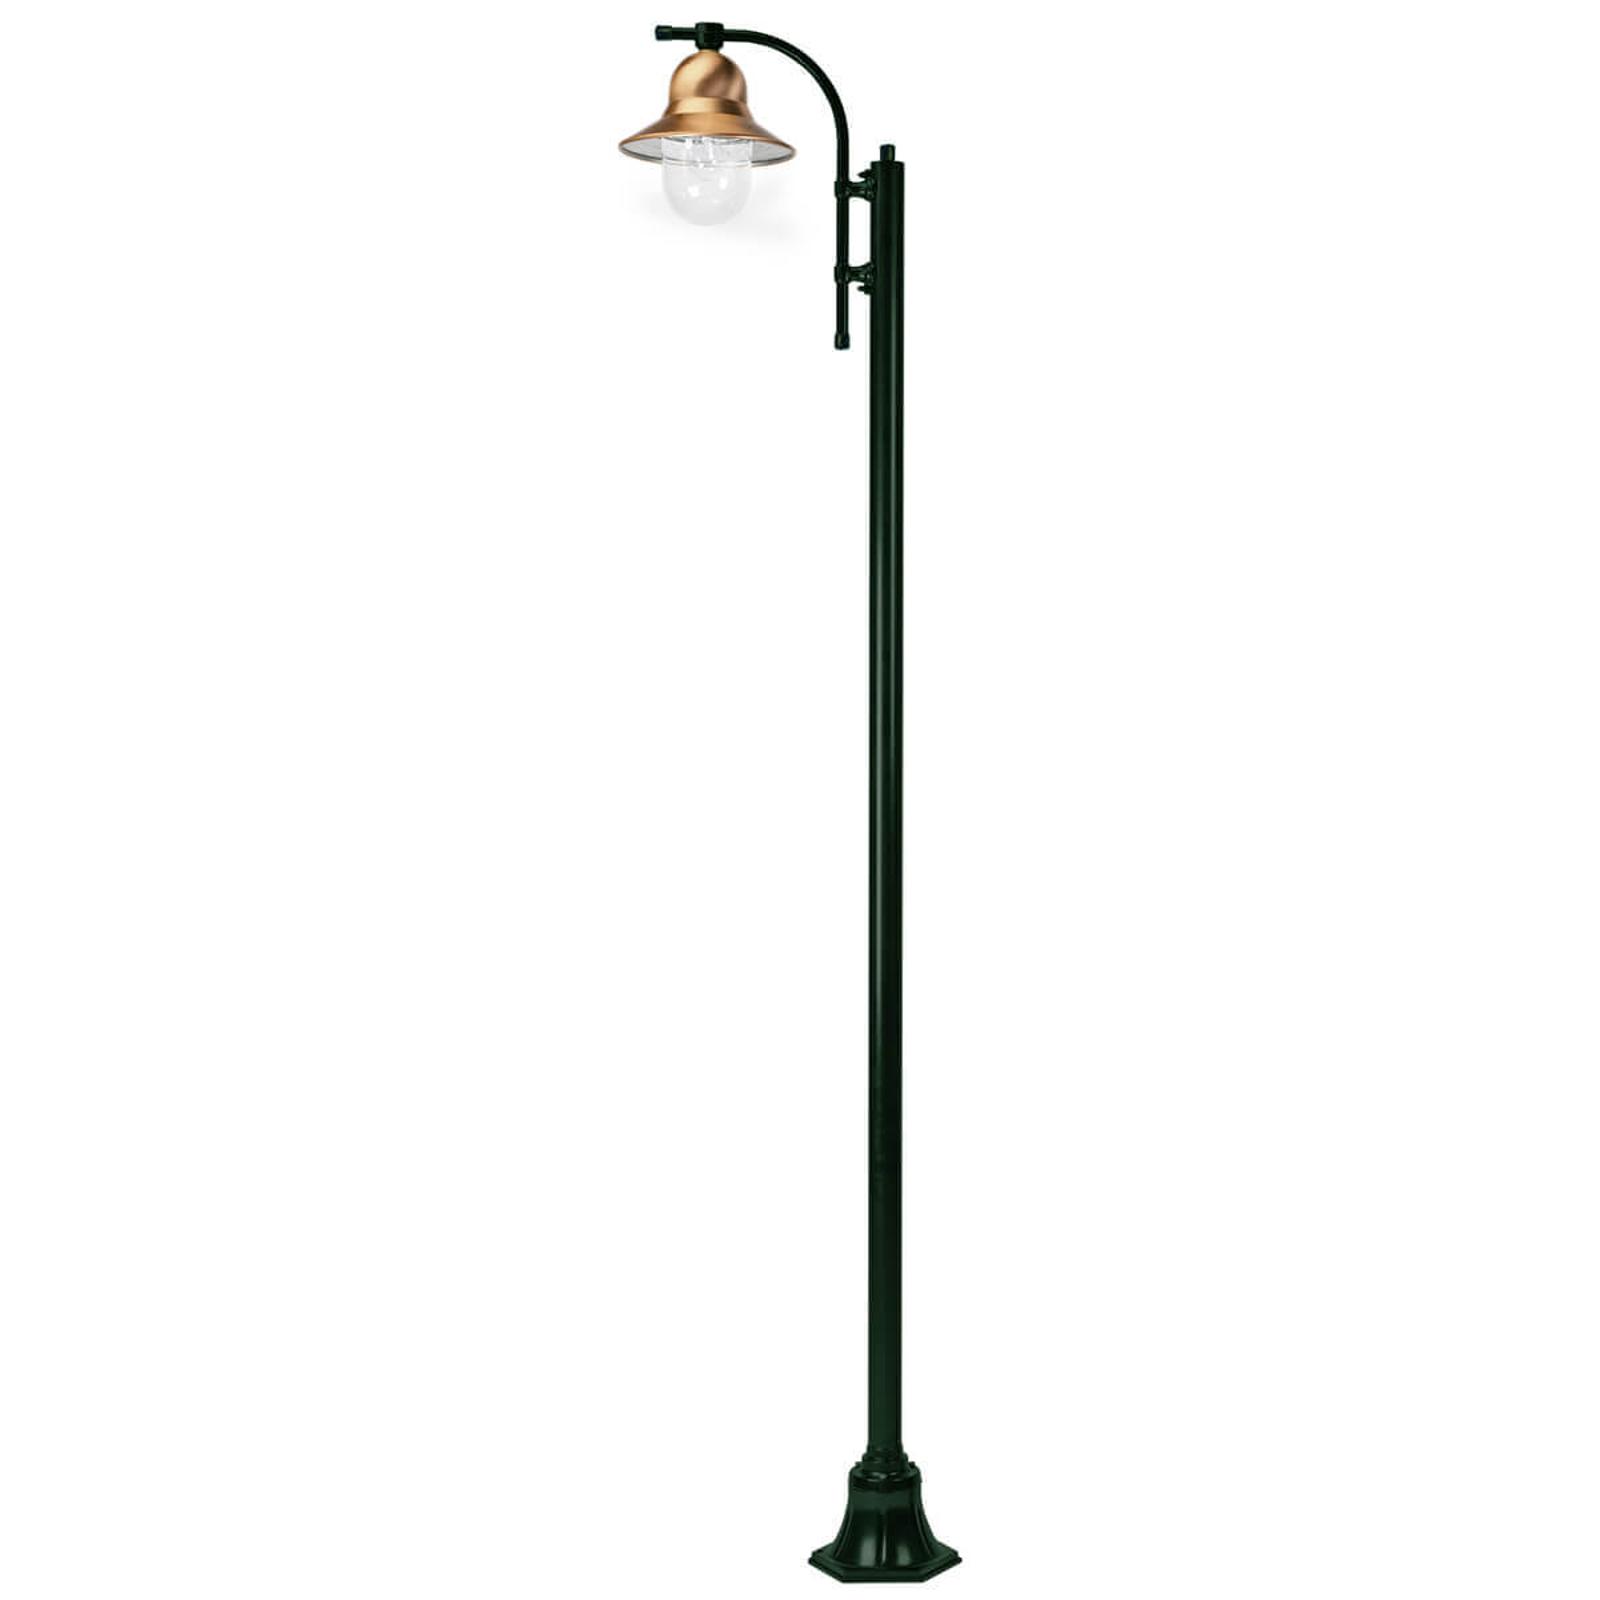 Lampadaire Toscane à 1 lampe 240cm vert